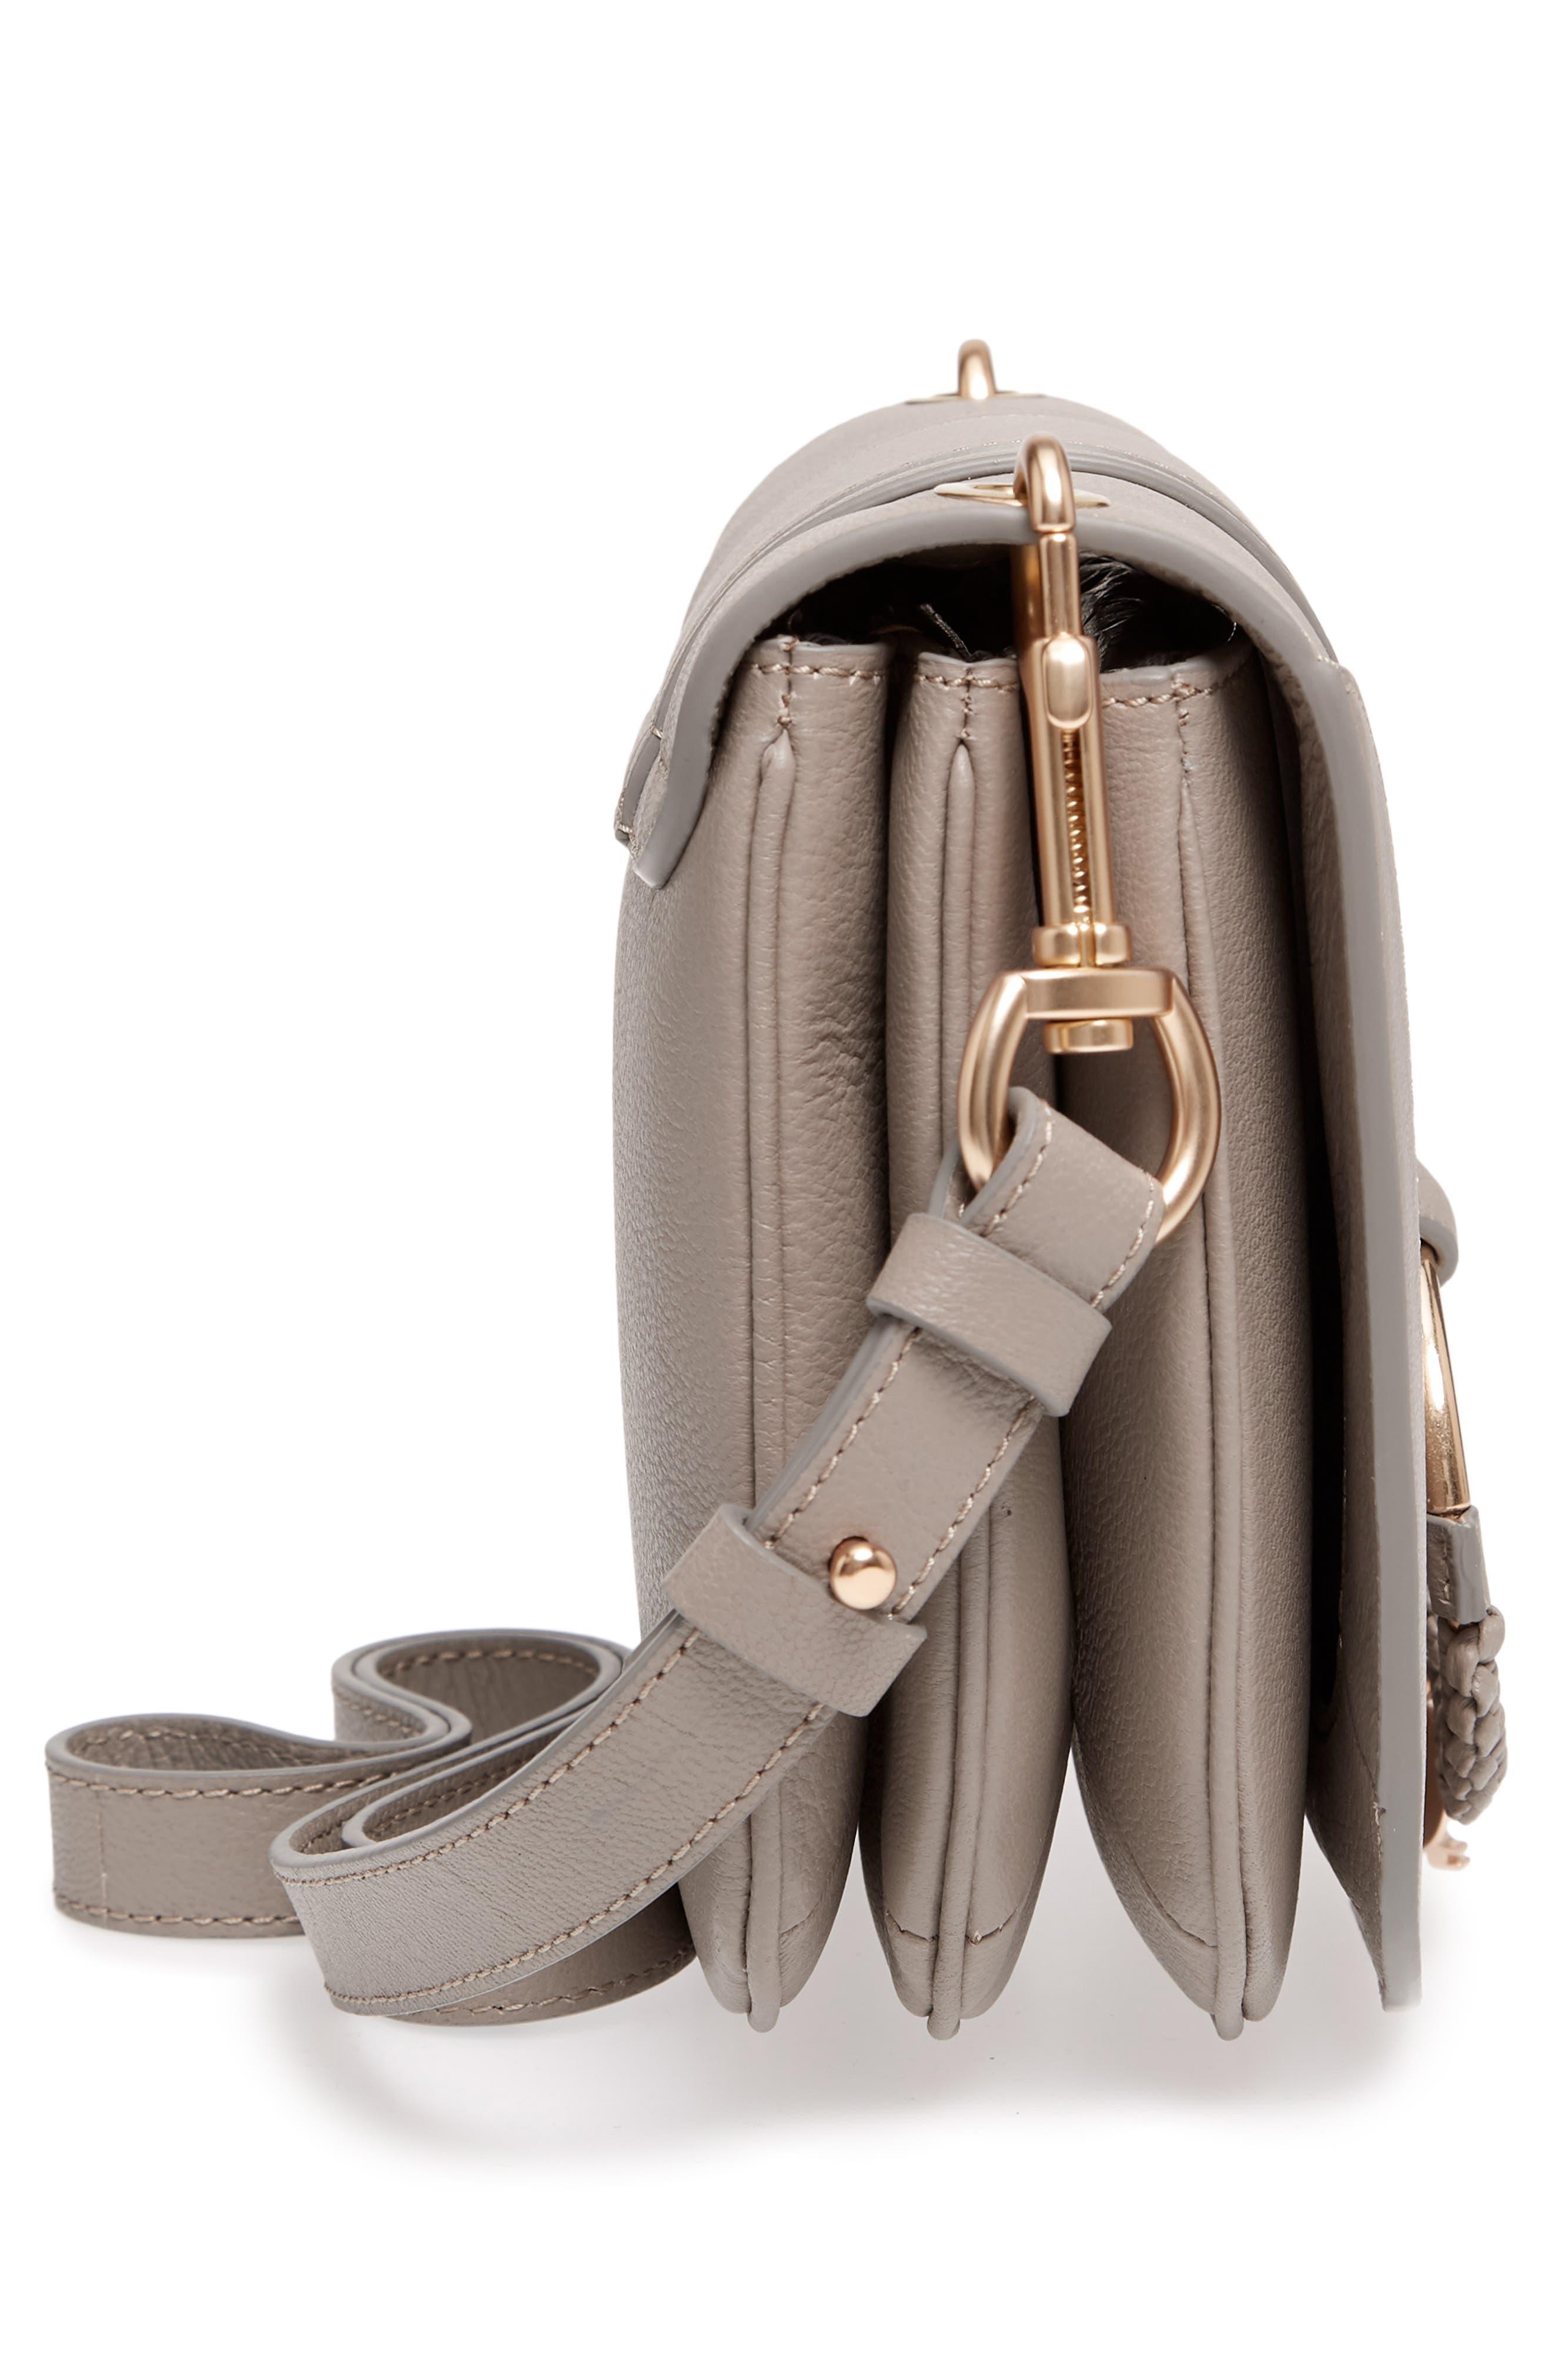 Hana Small Leather Crossbody Bag,                             Alternate thumbnail 26, color,